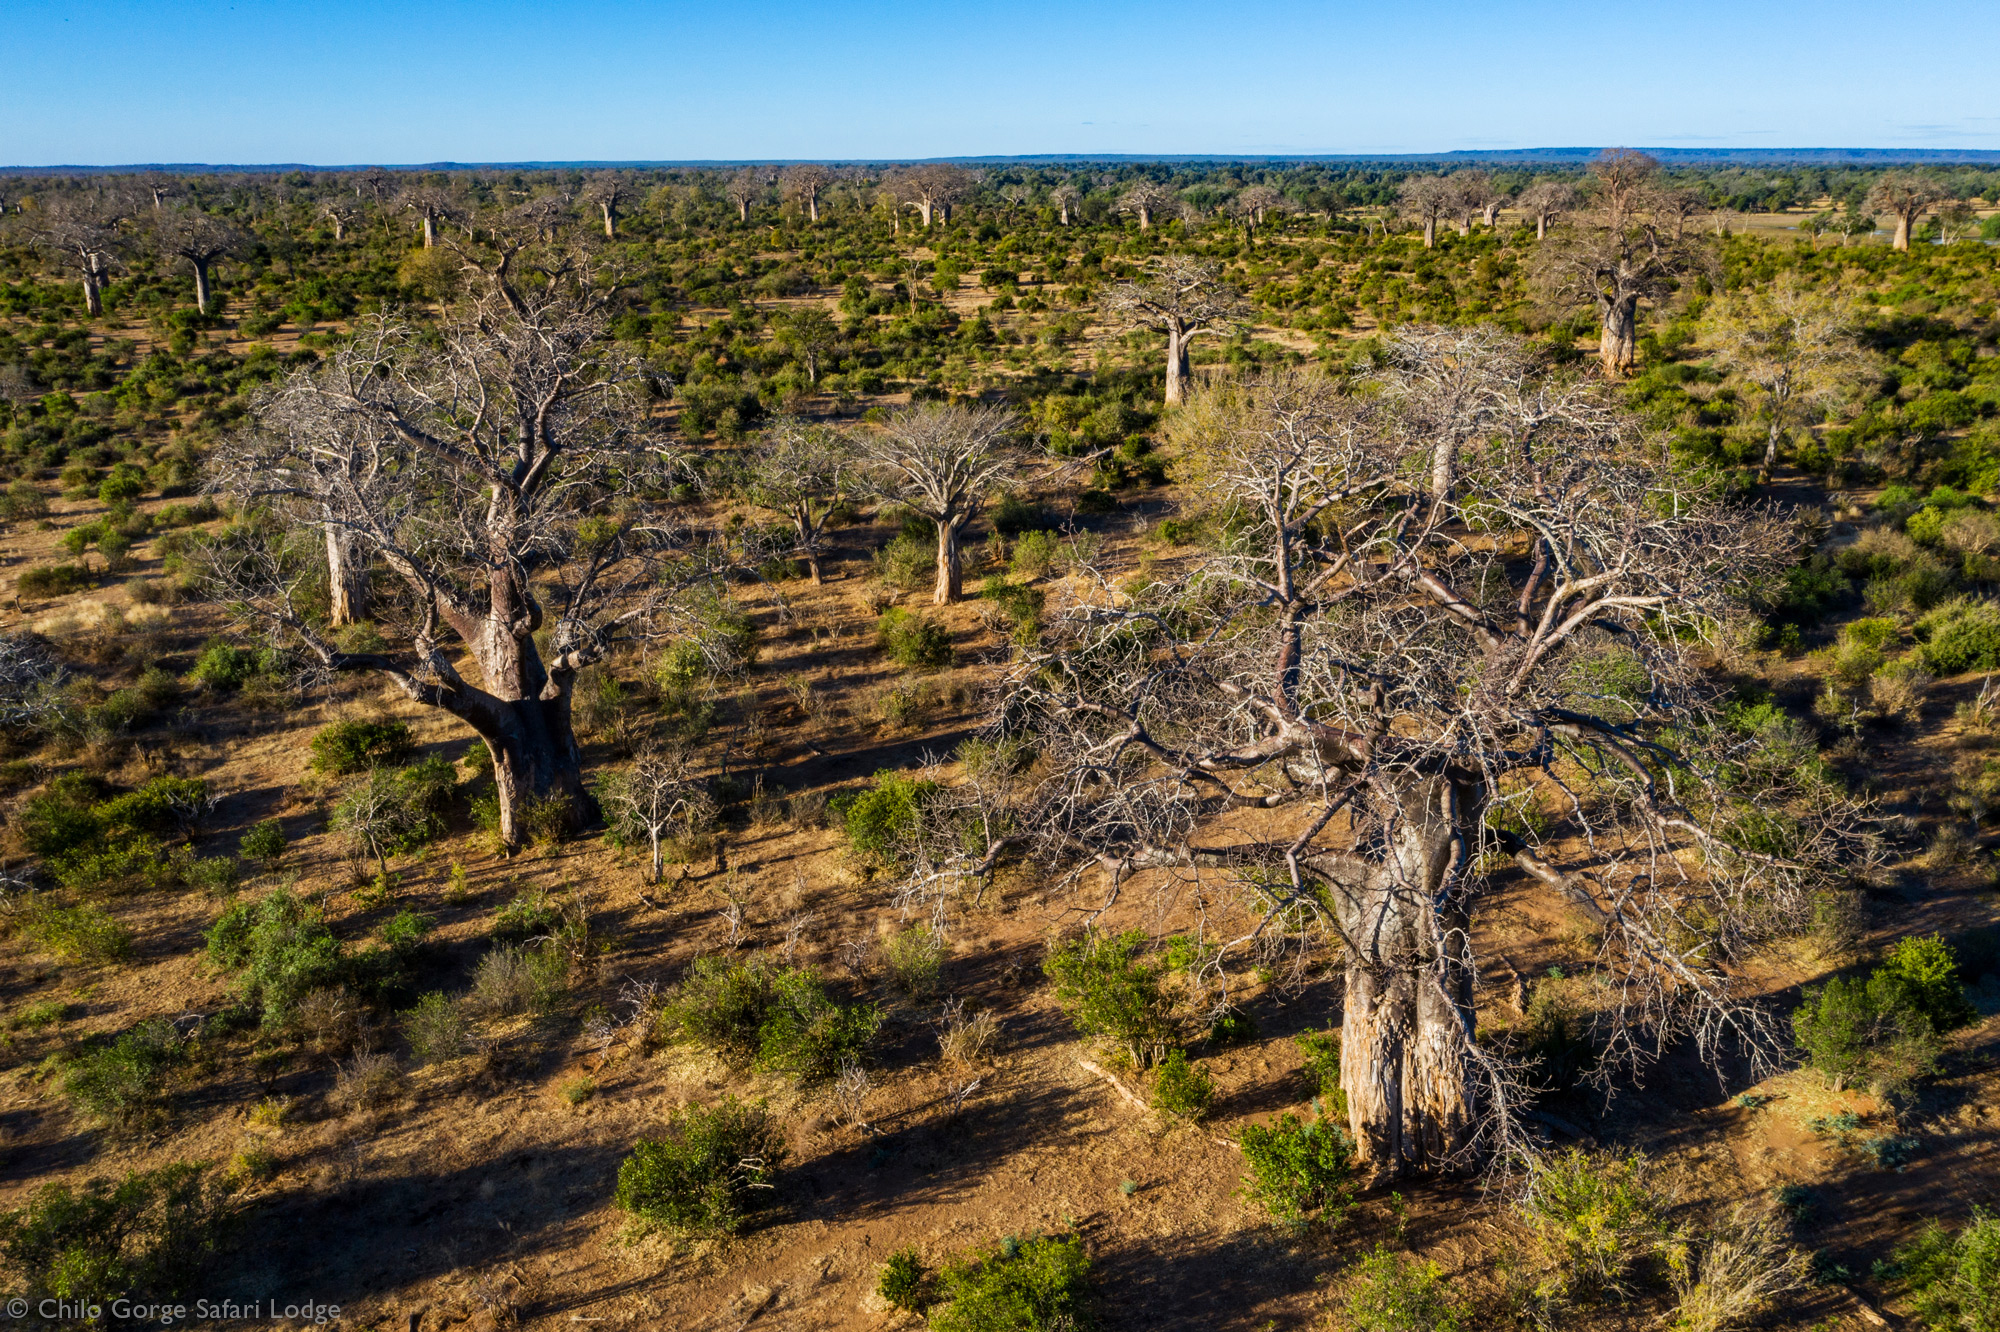 Baobab trees in Gonarezhou National Park